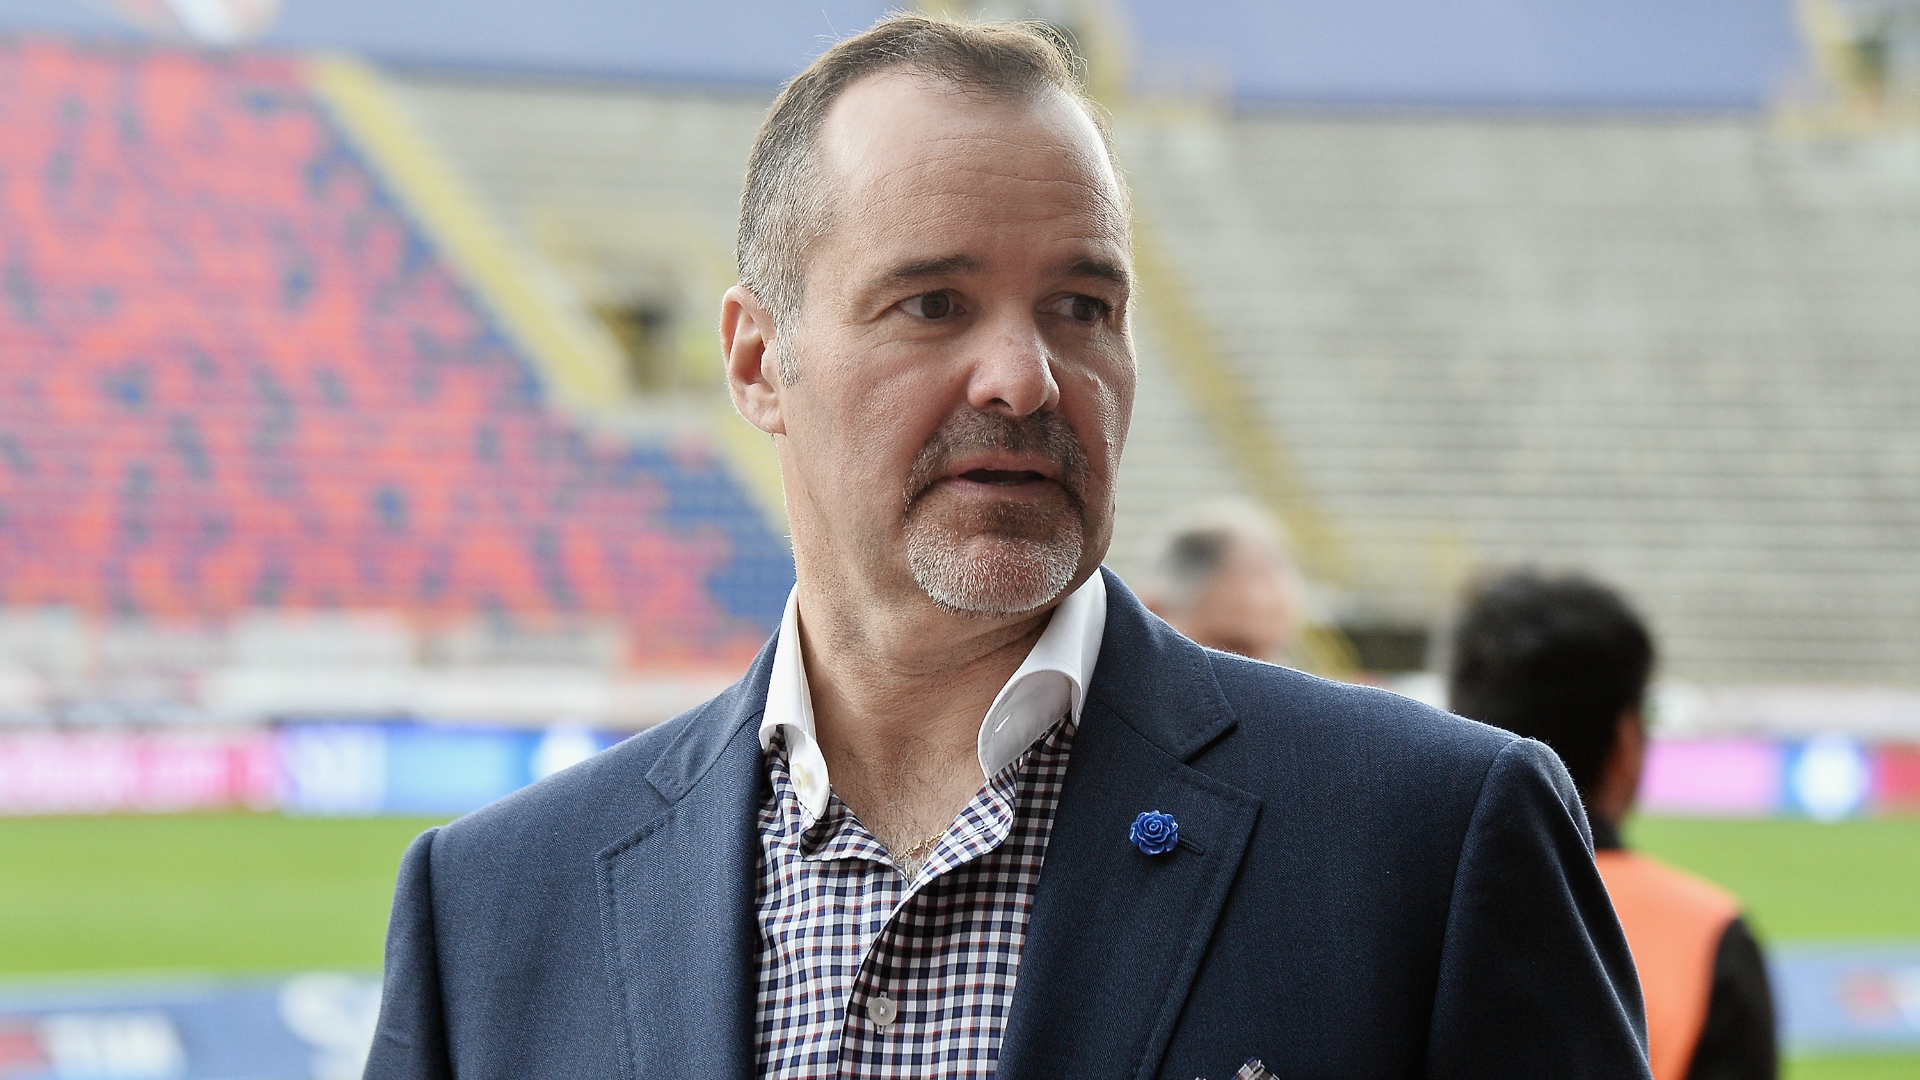 Joey Saputo Bologna chairman